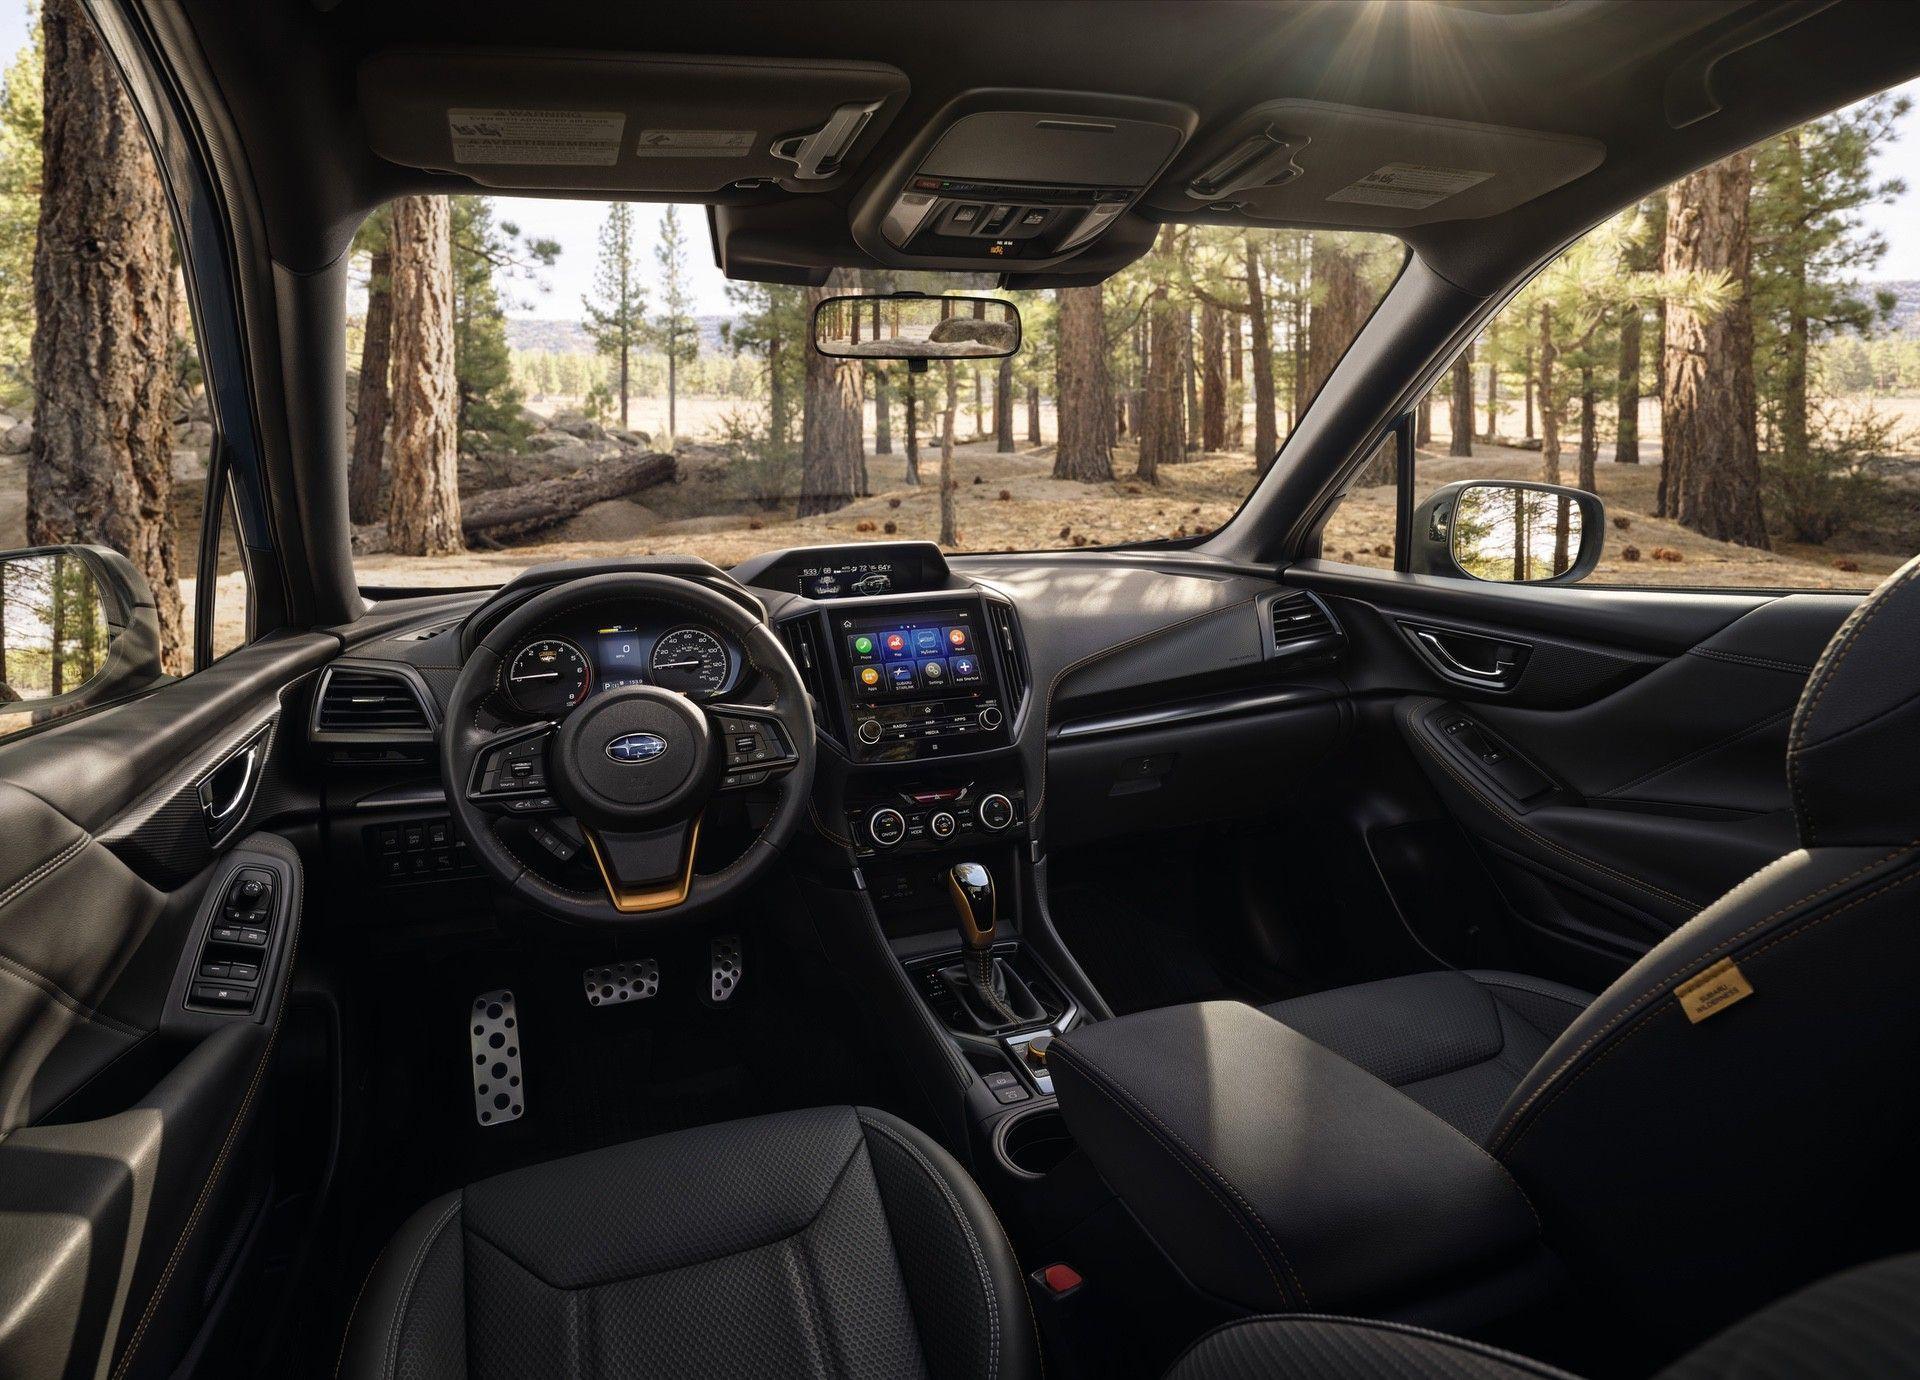 Subaru_Forester_Wilderness-0015